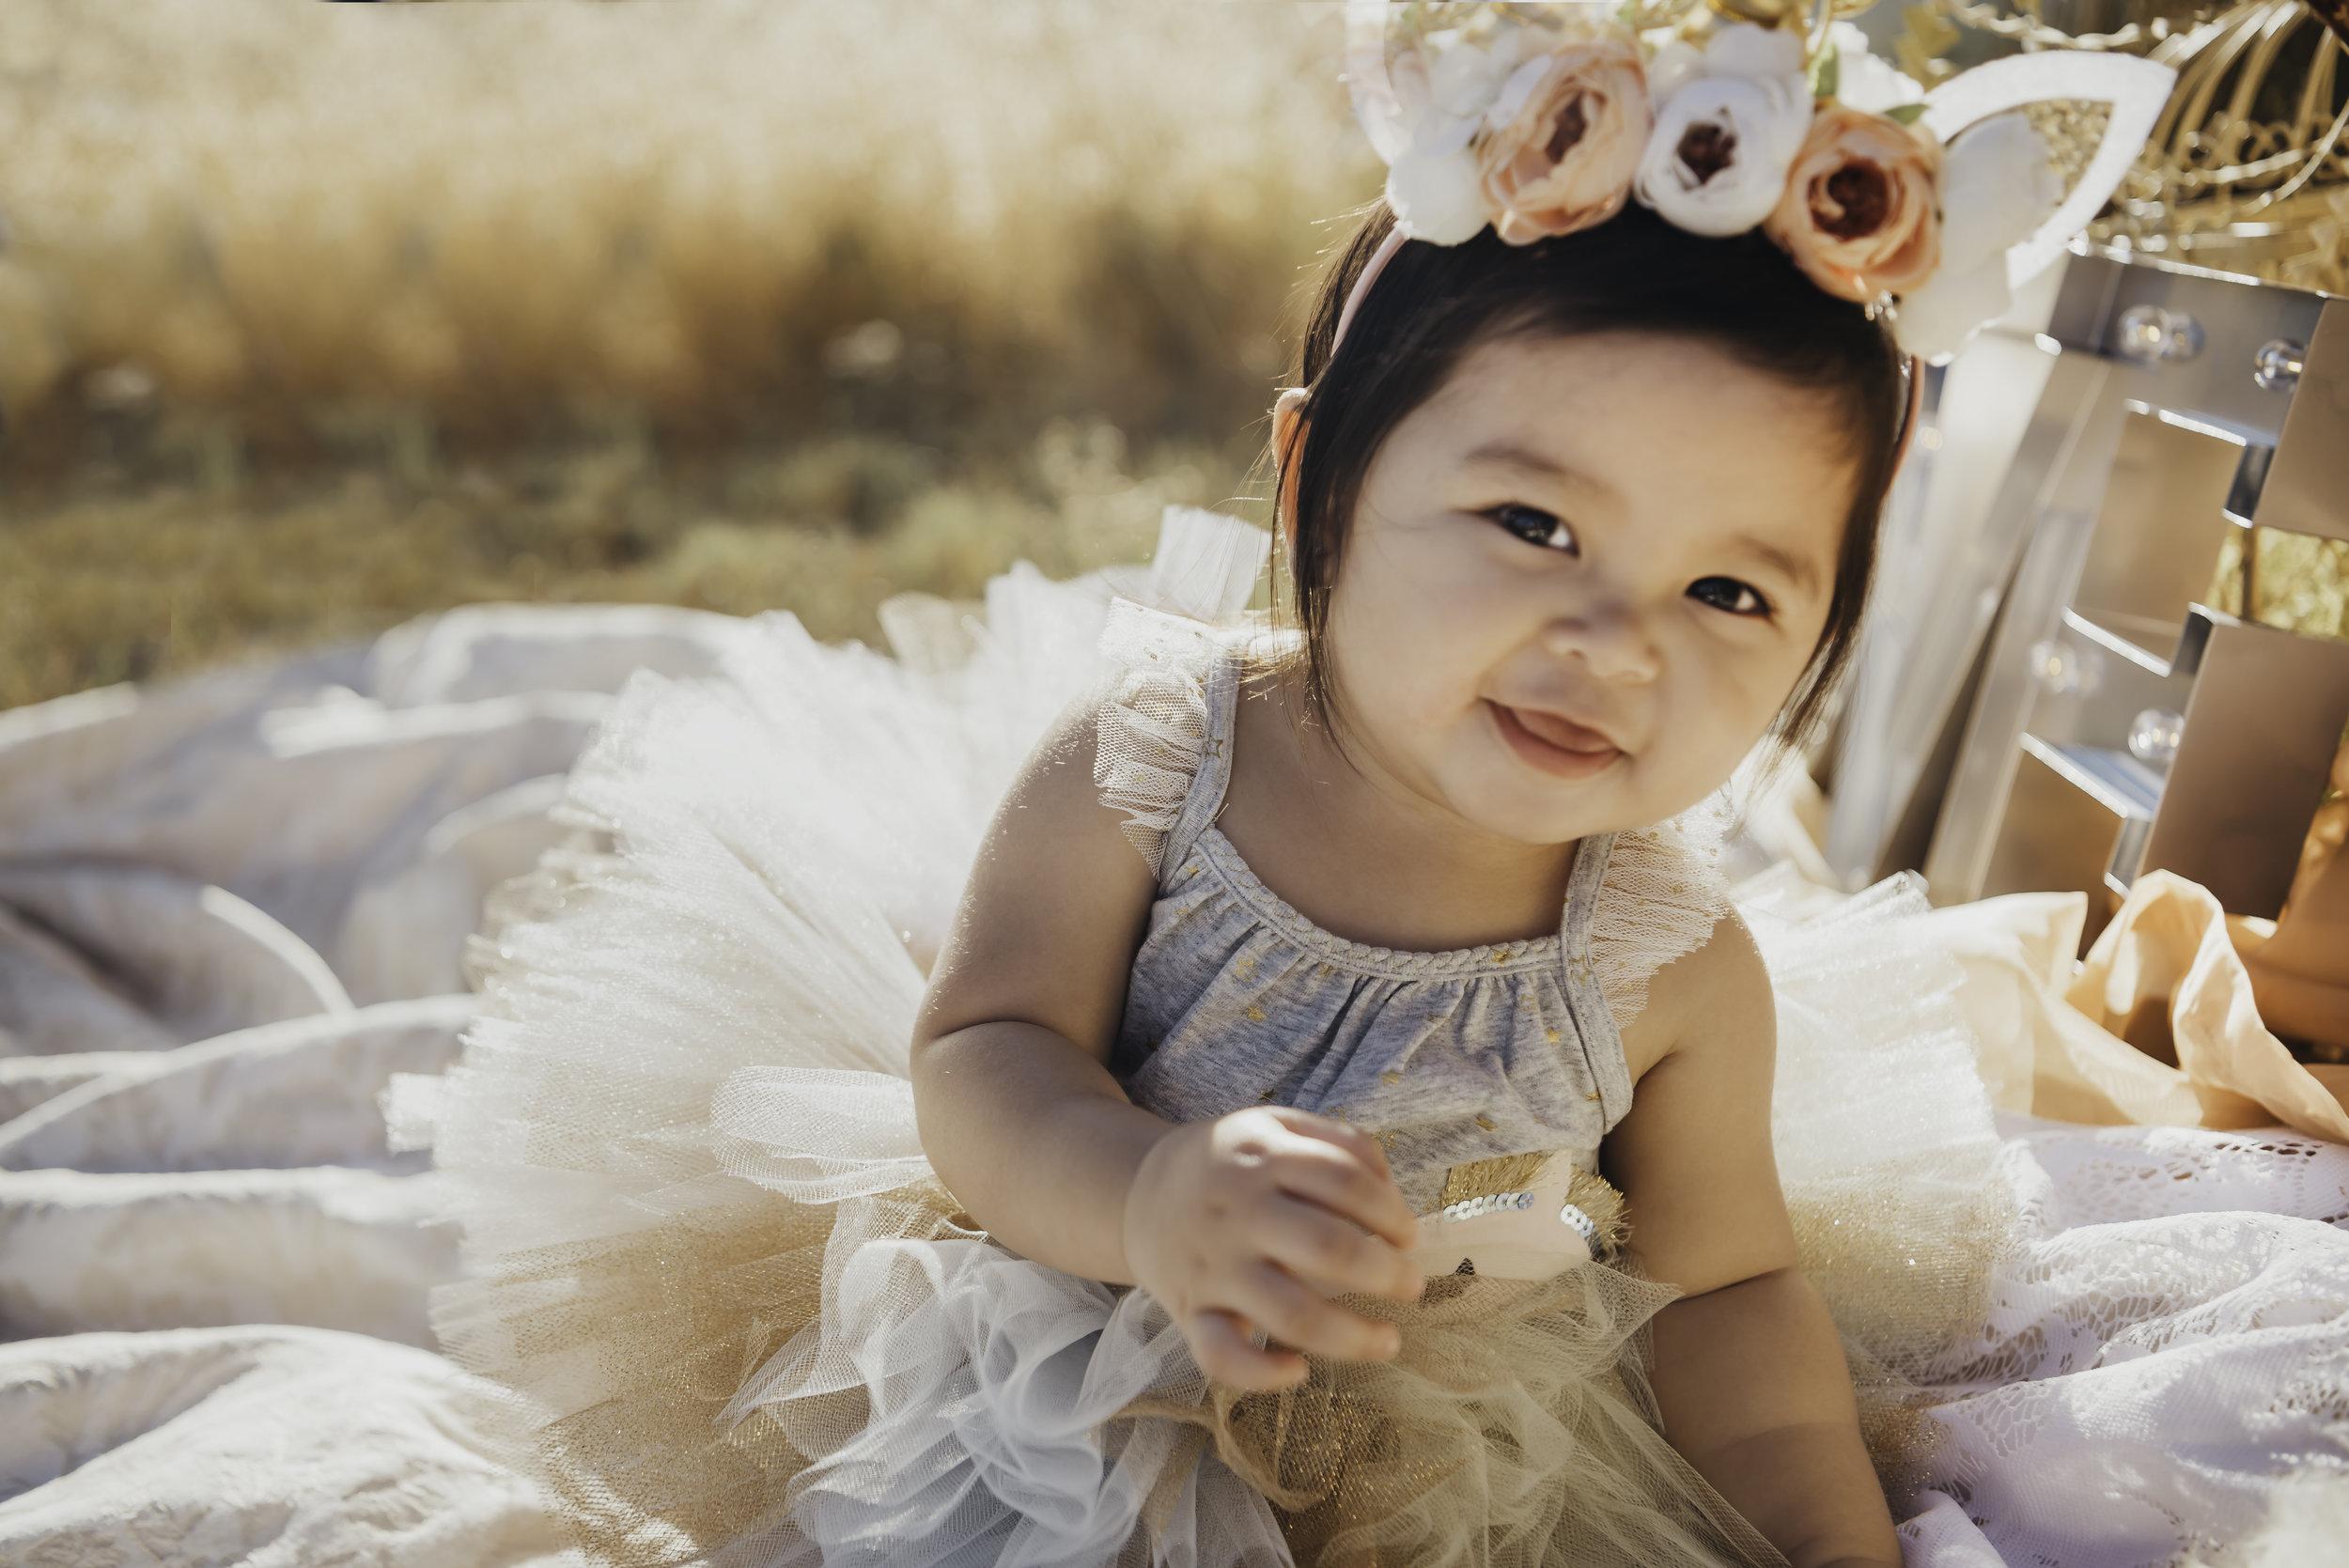 FINAL_Lets_Spread_Beauty_Photography_Landon_Newborn20150908_0029.jpg